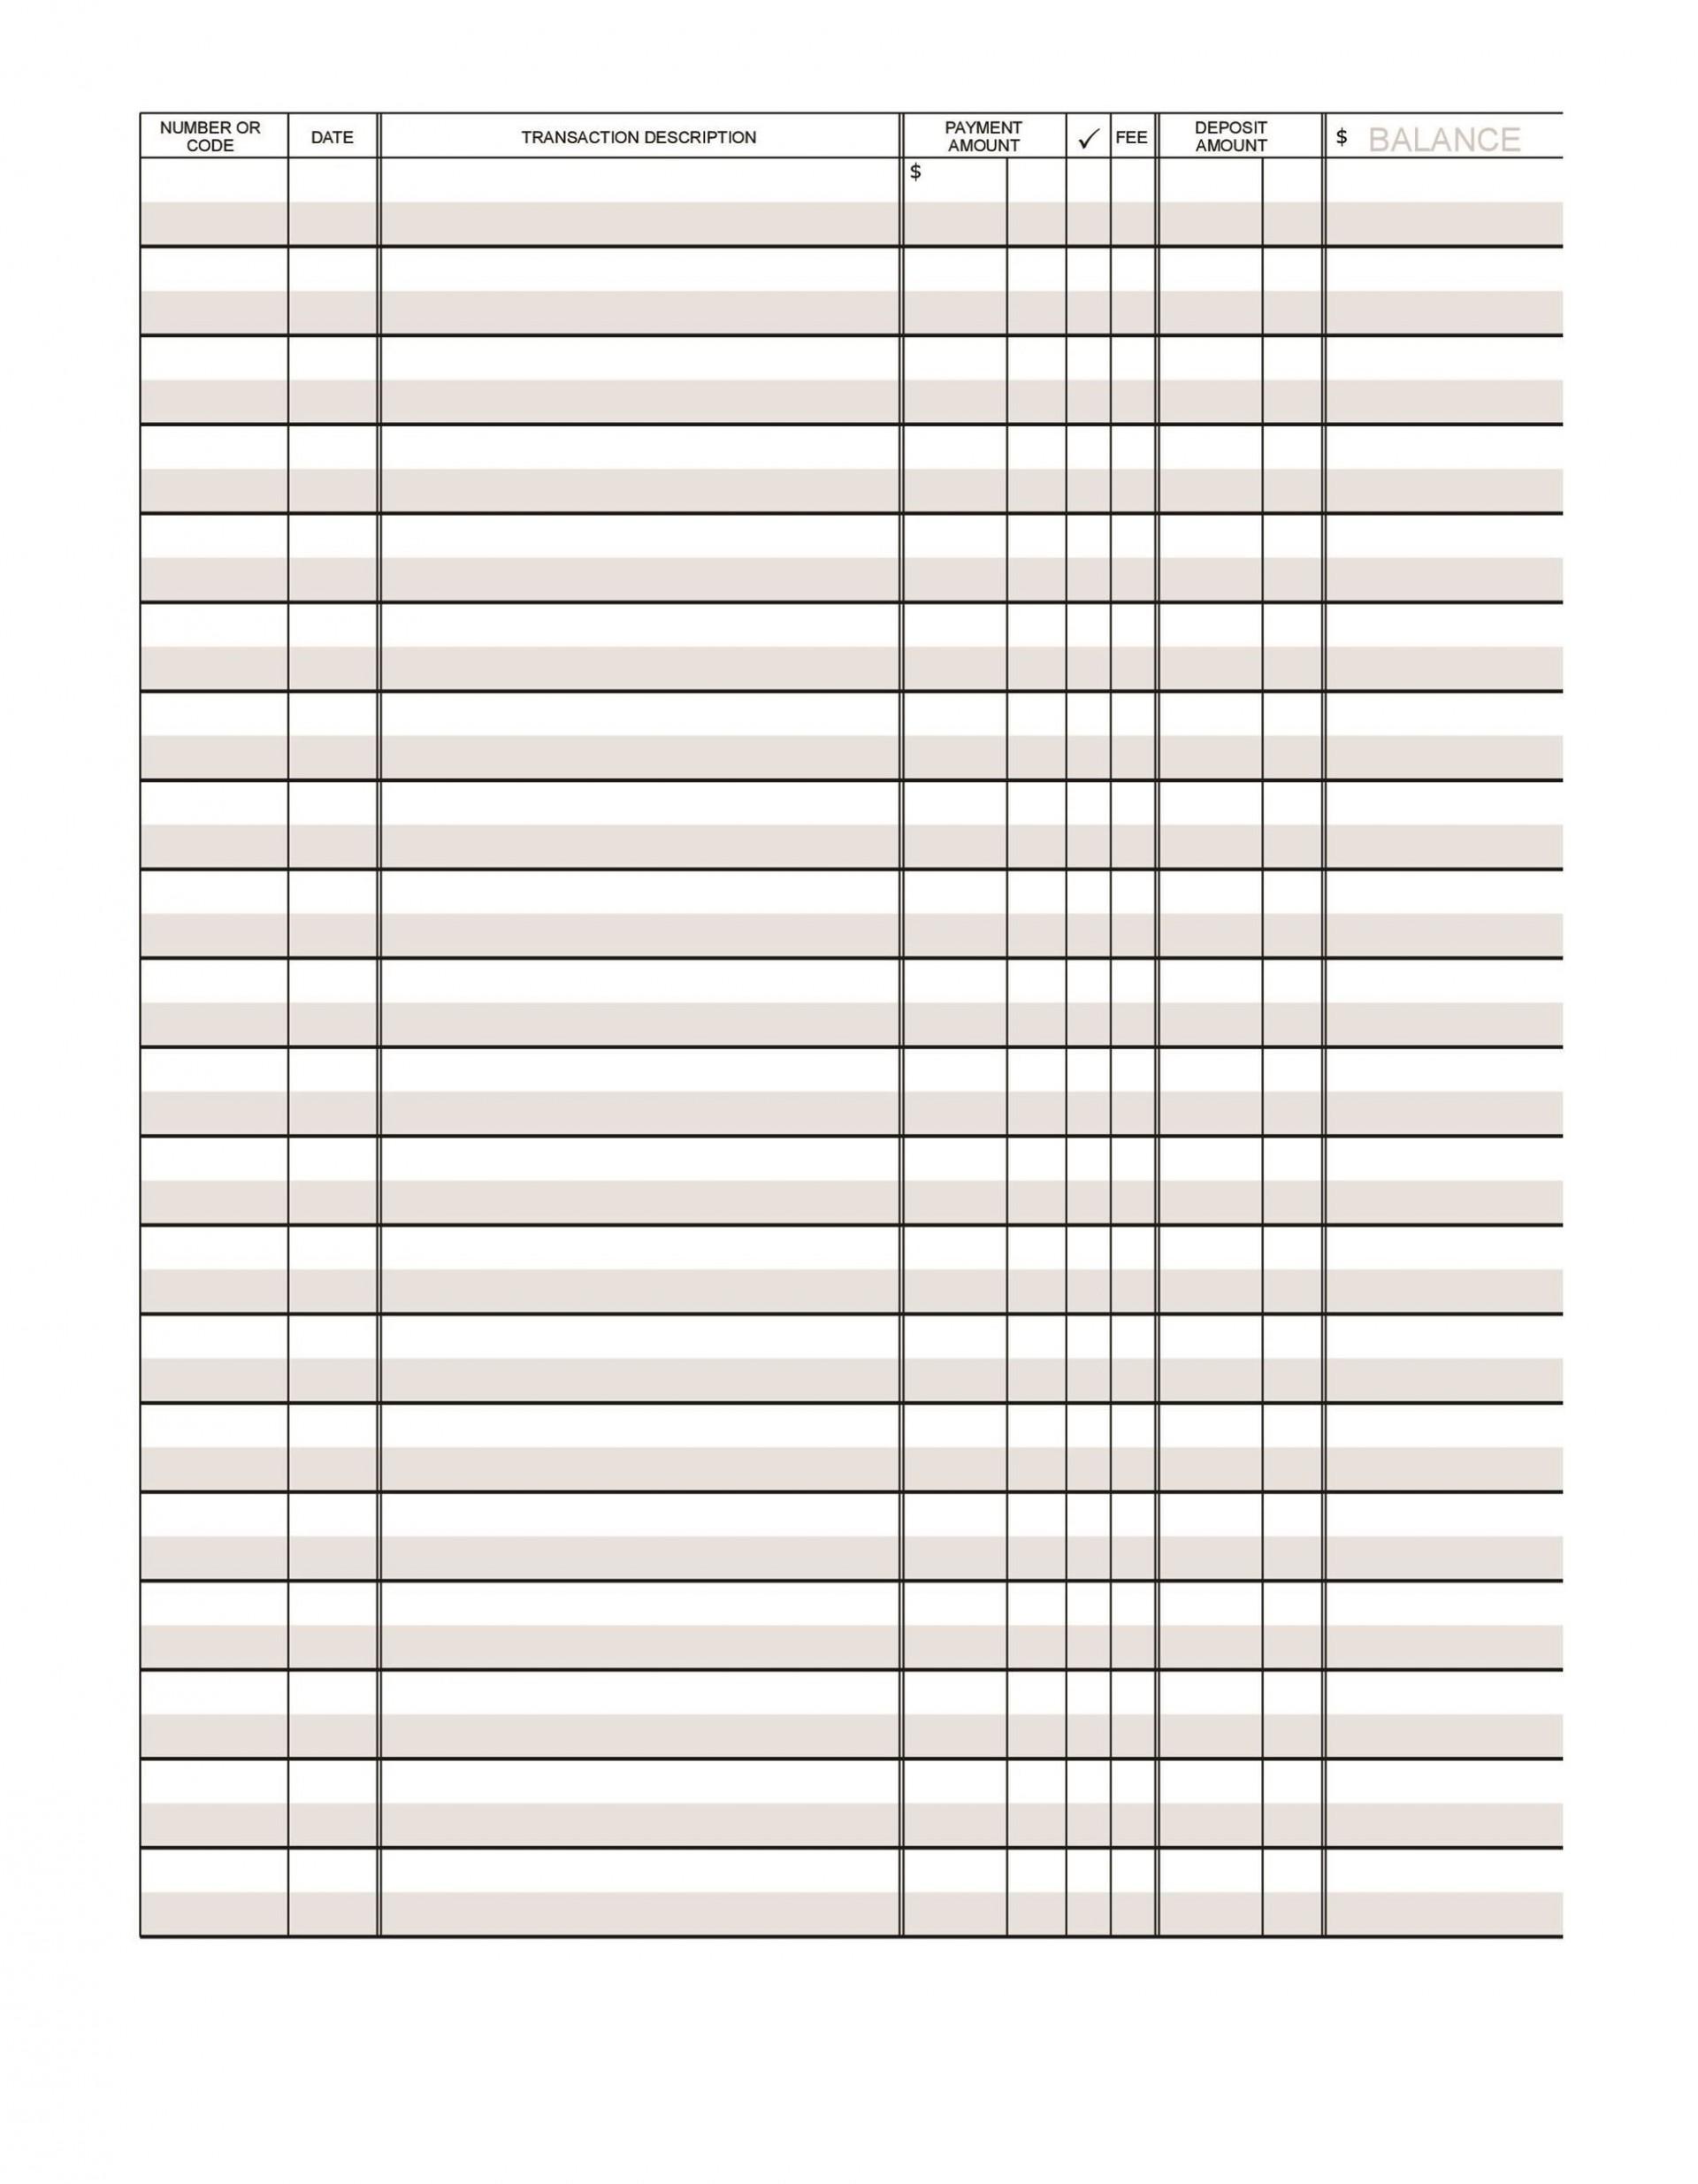 004 Fascinating Checkbook Register Template Excel 2013 Highest Quality 1920